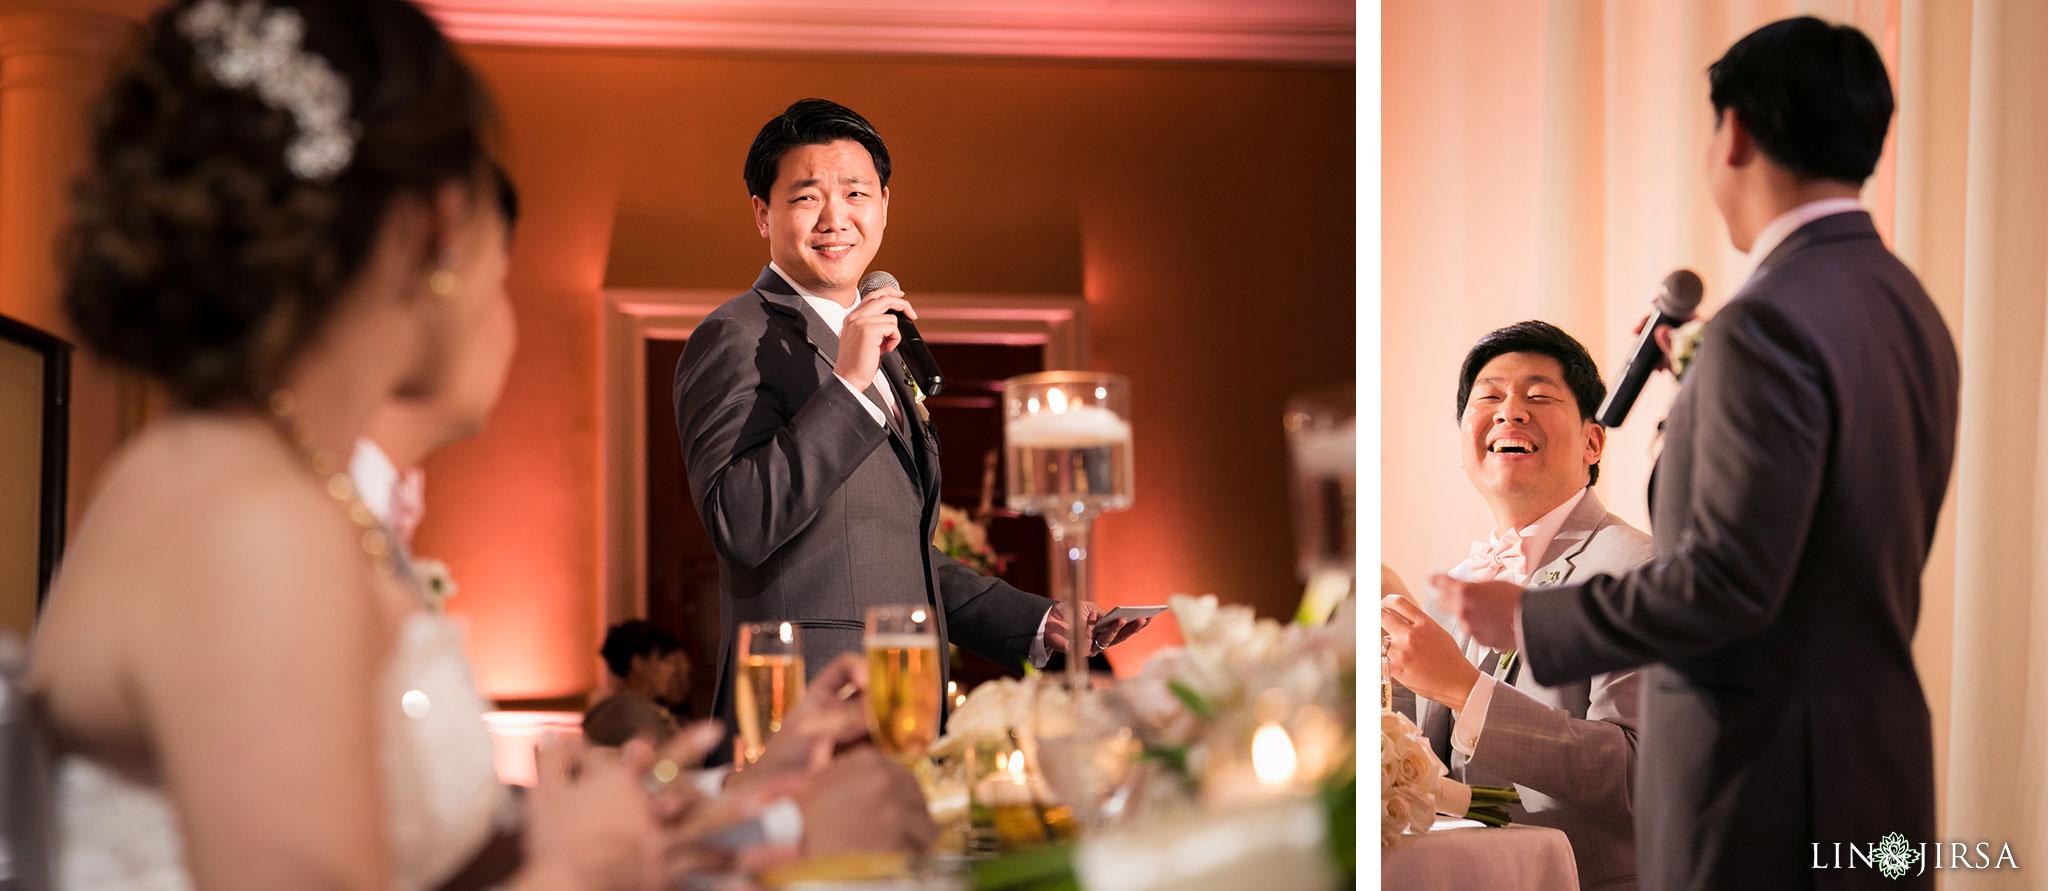 50 monarch beach resort wedding reception photography